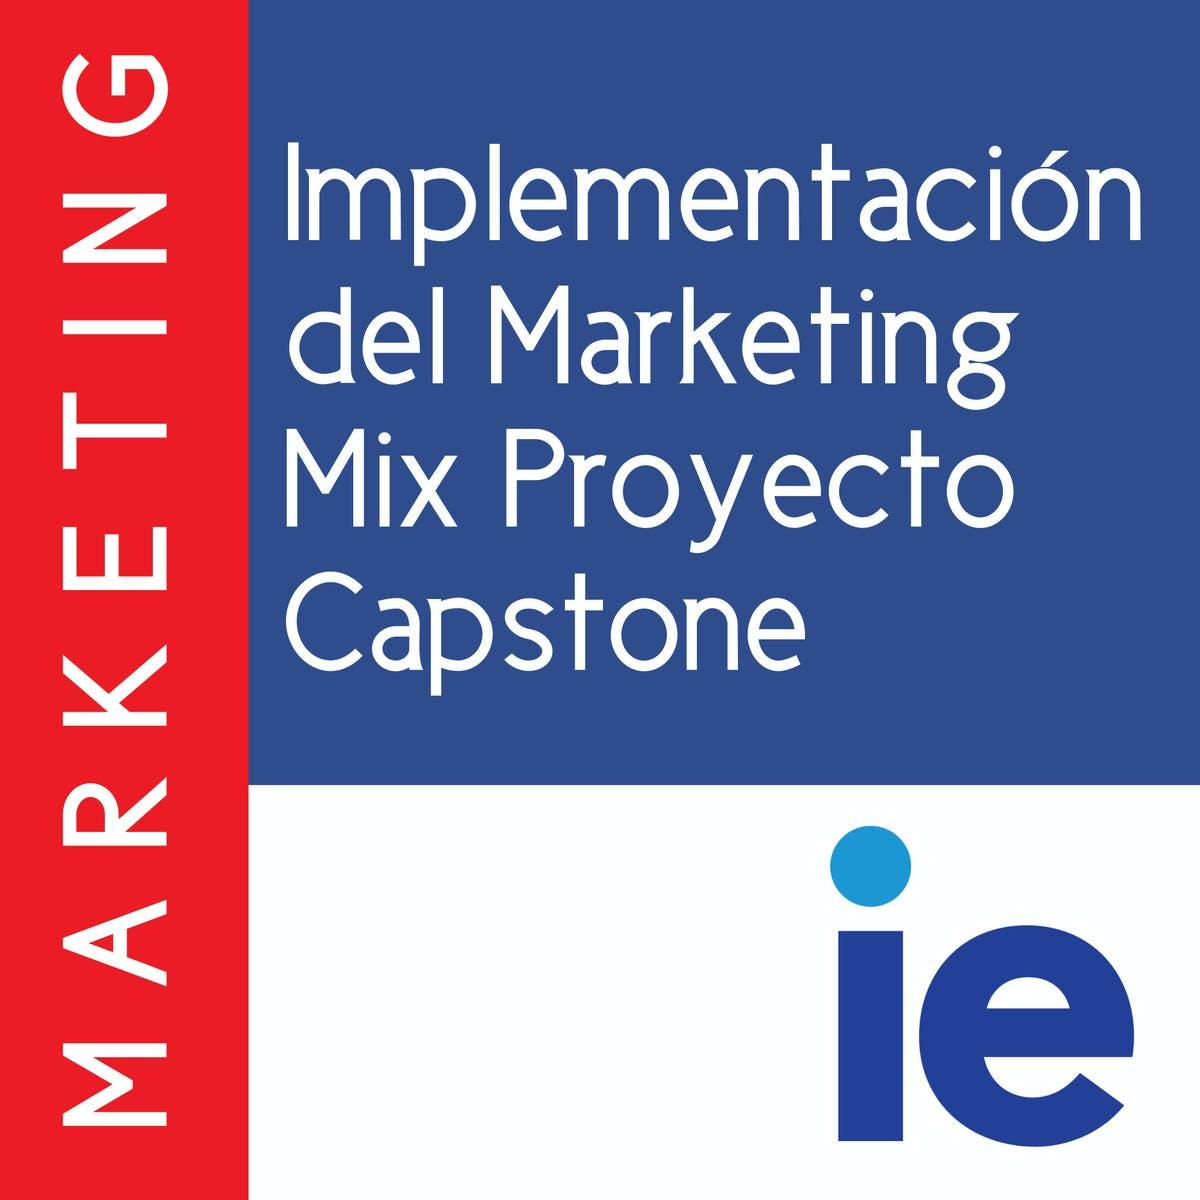 Implementación del Marketing Mix Proyecto Capstone   Coursera